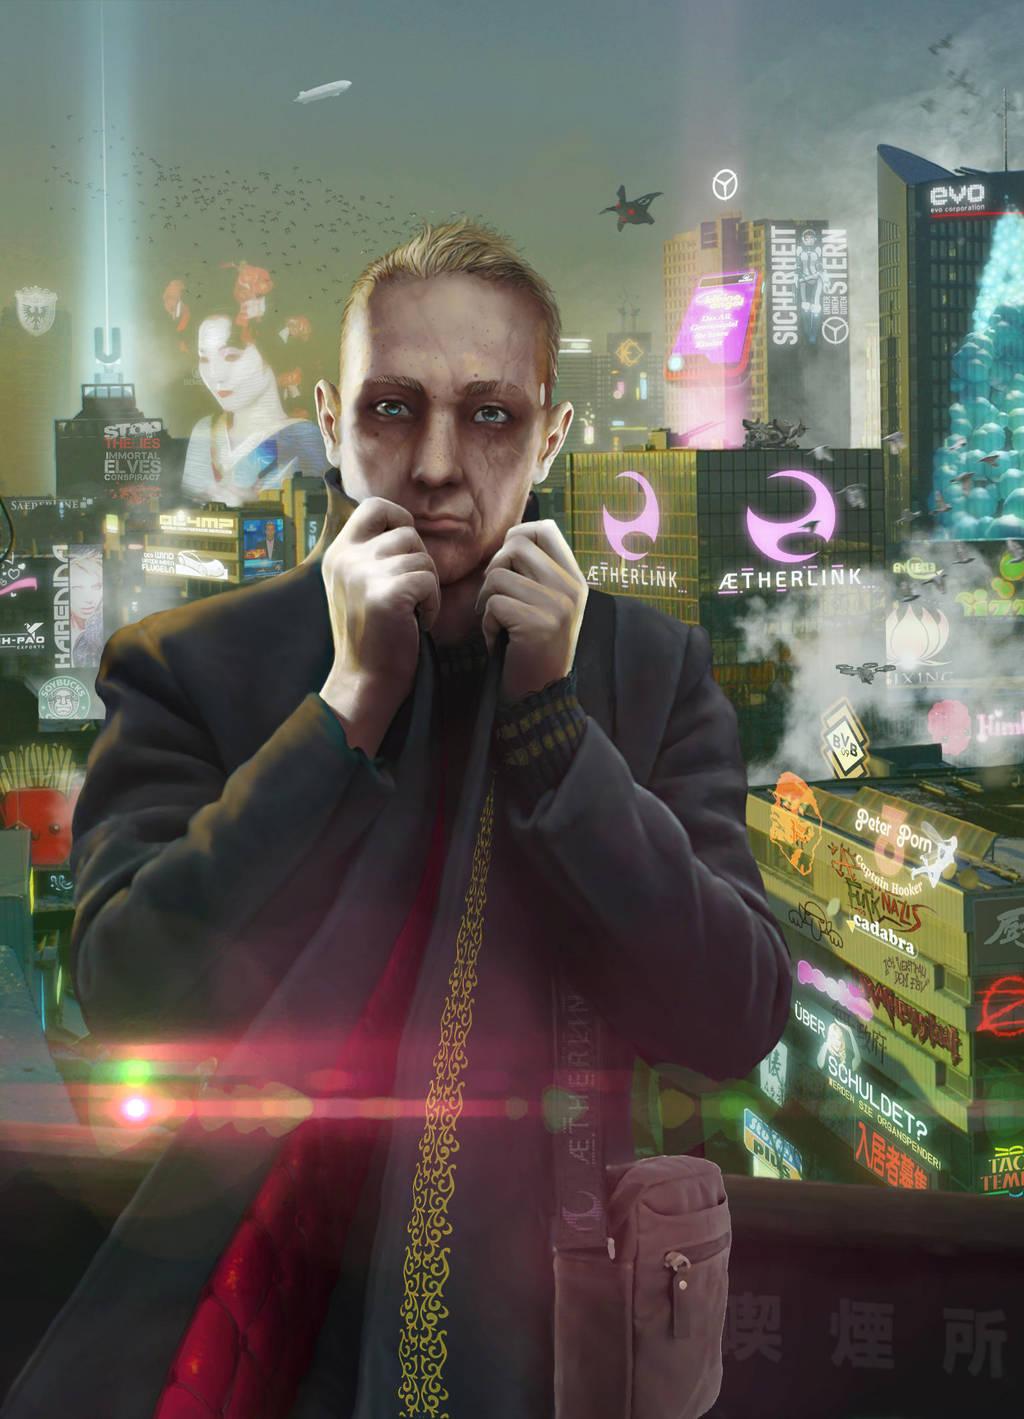 Shadowrun Novel Cover Iwans Weg by raben-aas